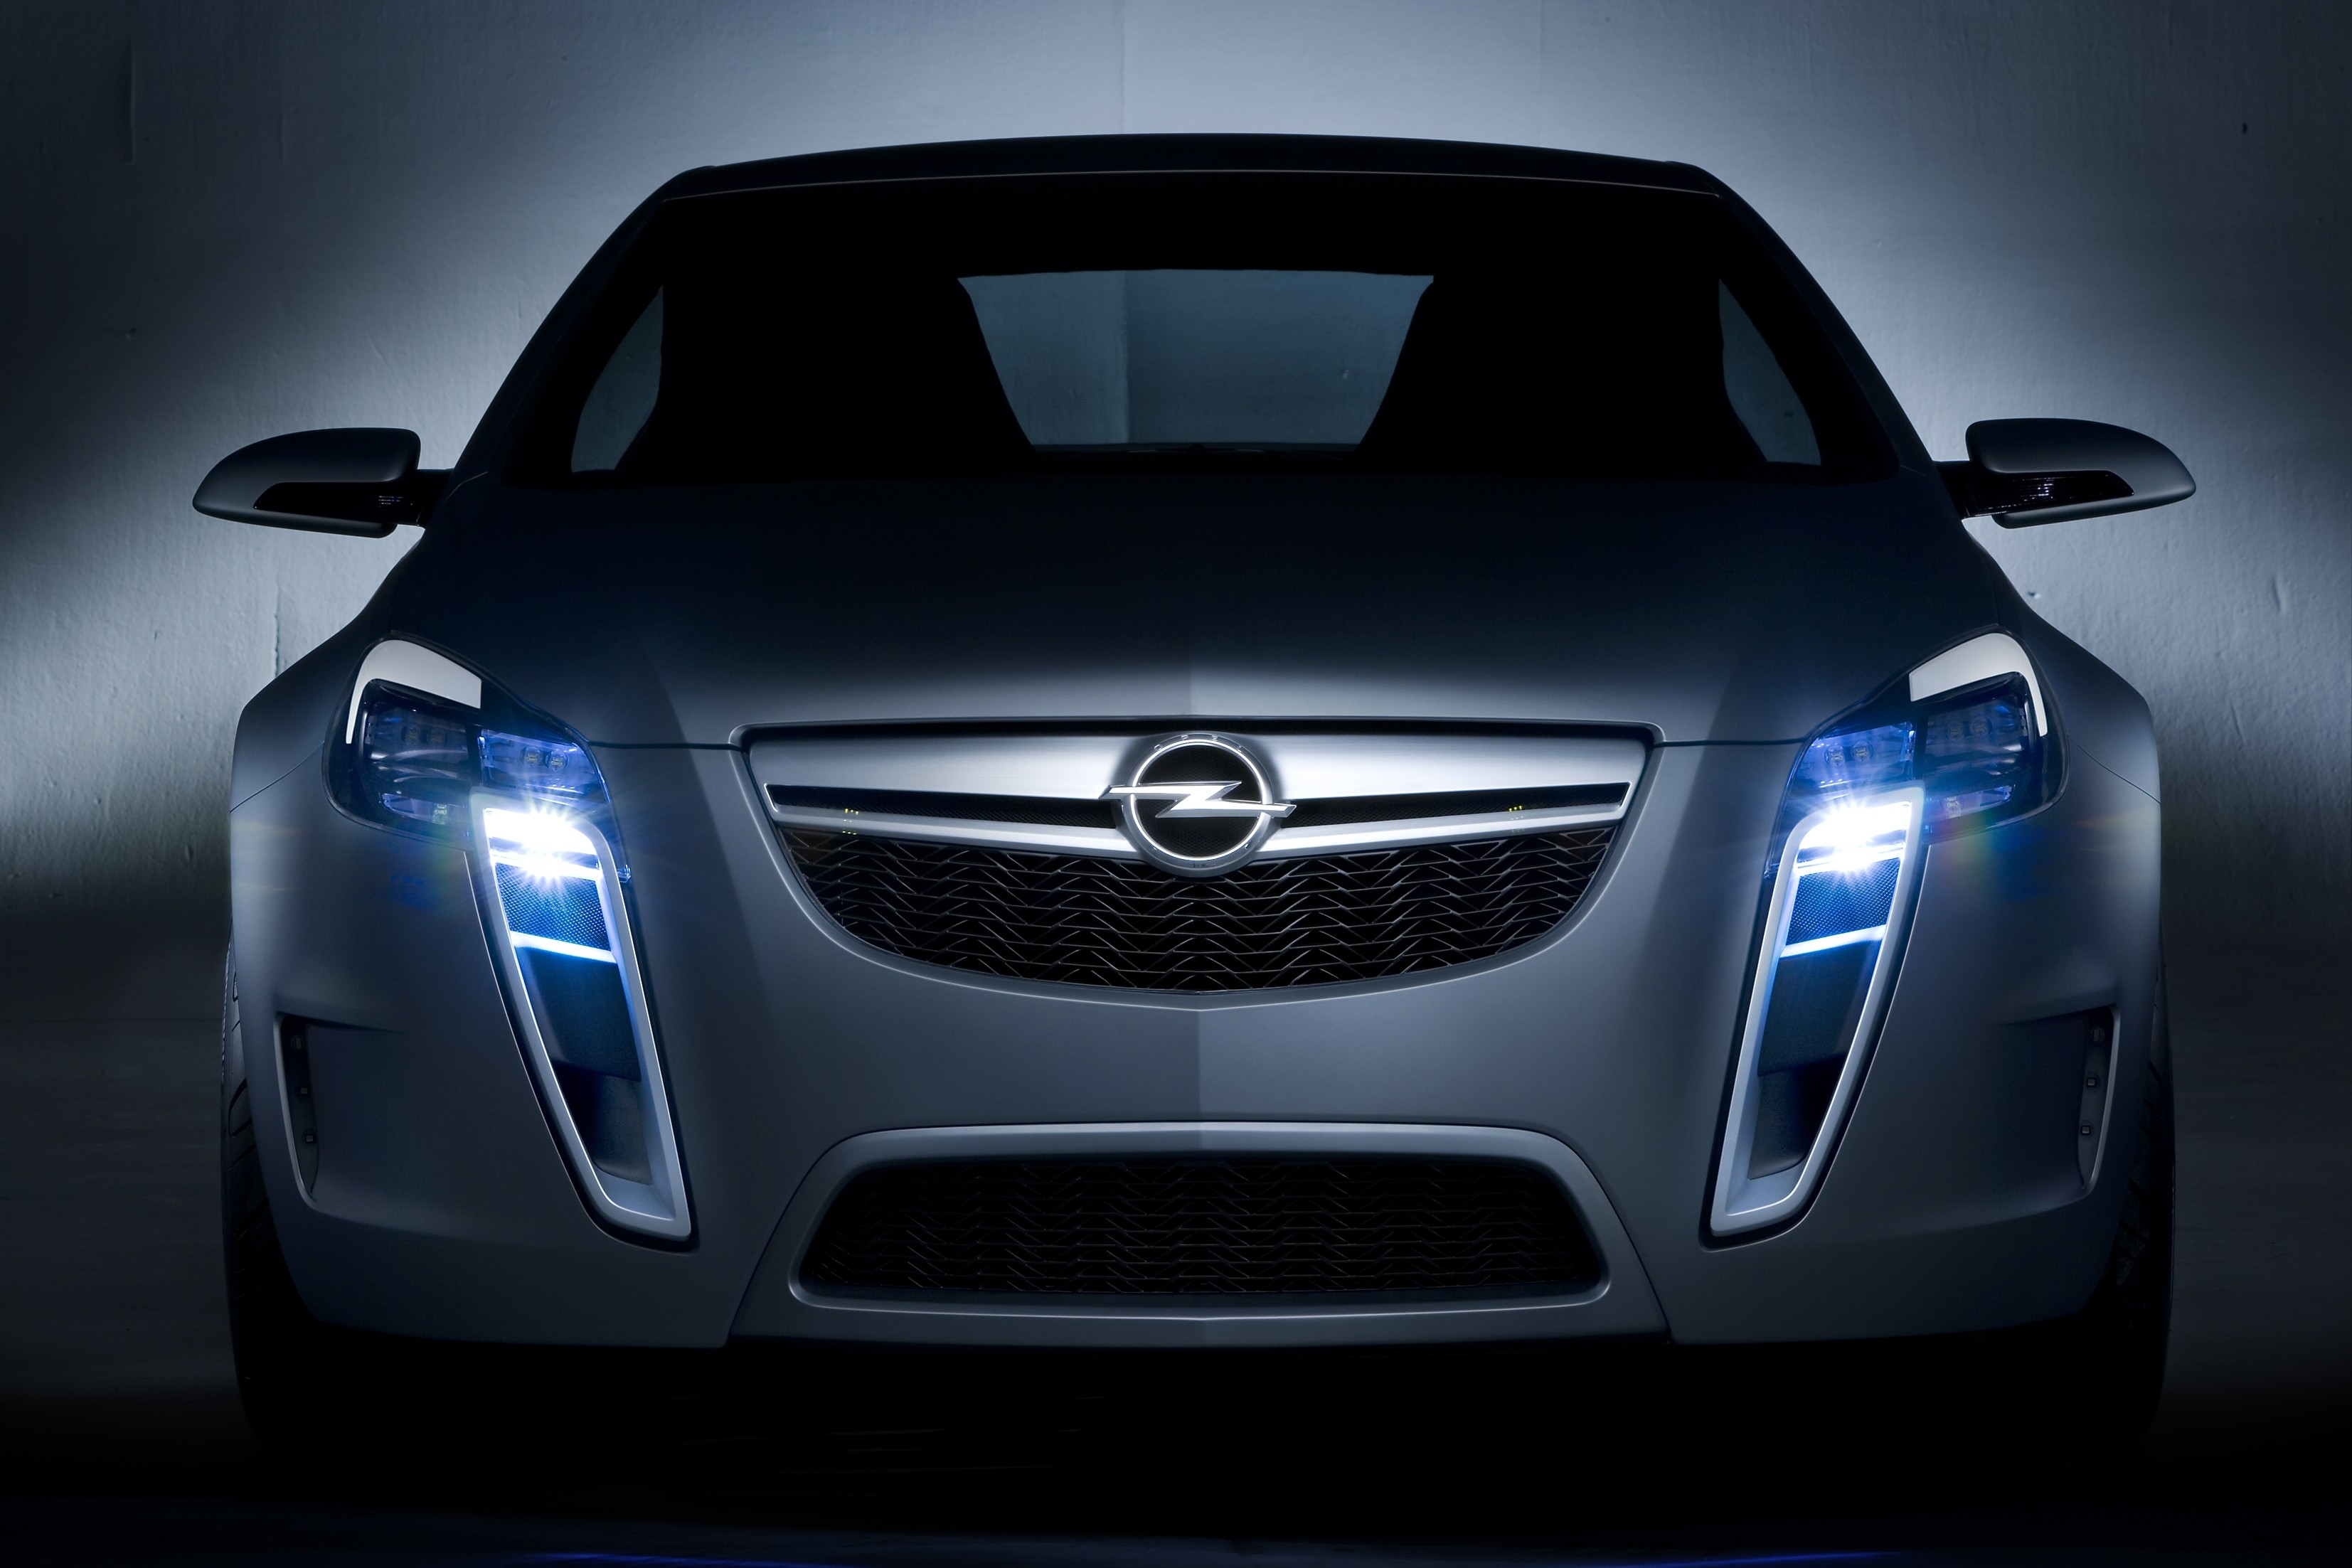 Opel HD Wallpaper Background Image 3307x2205 ID189444 3307x2205